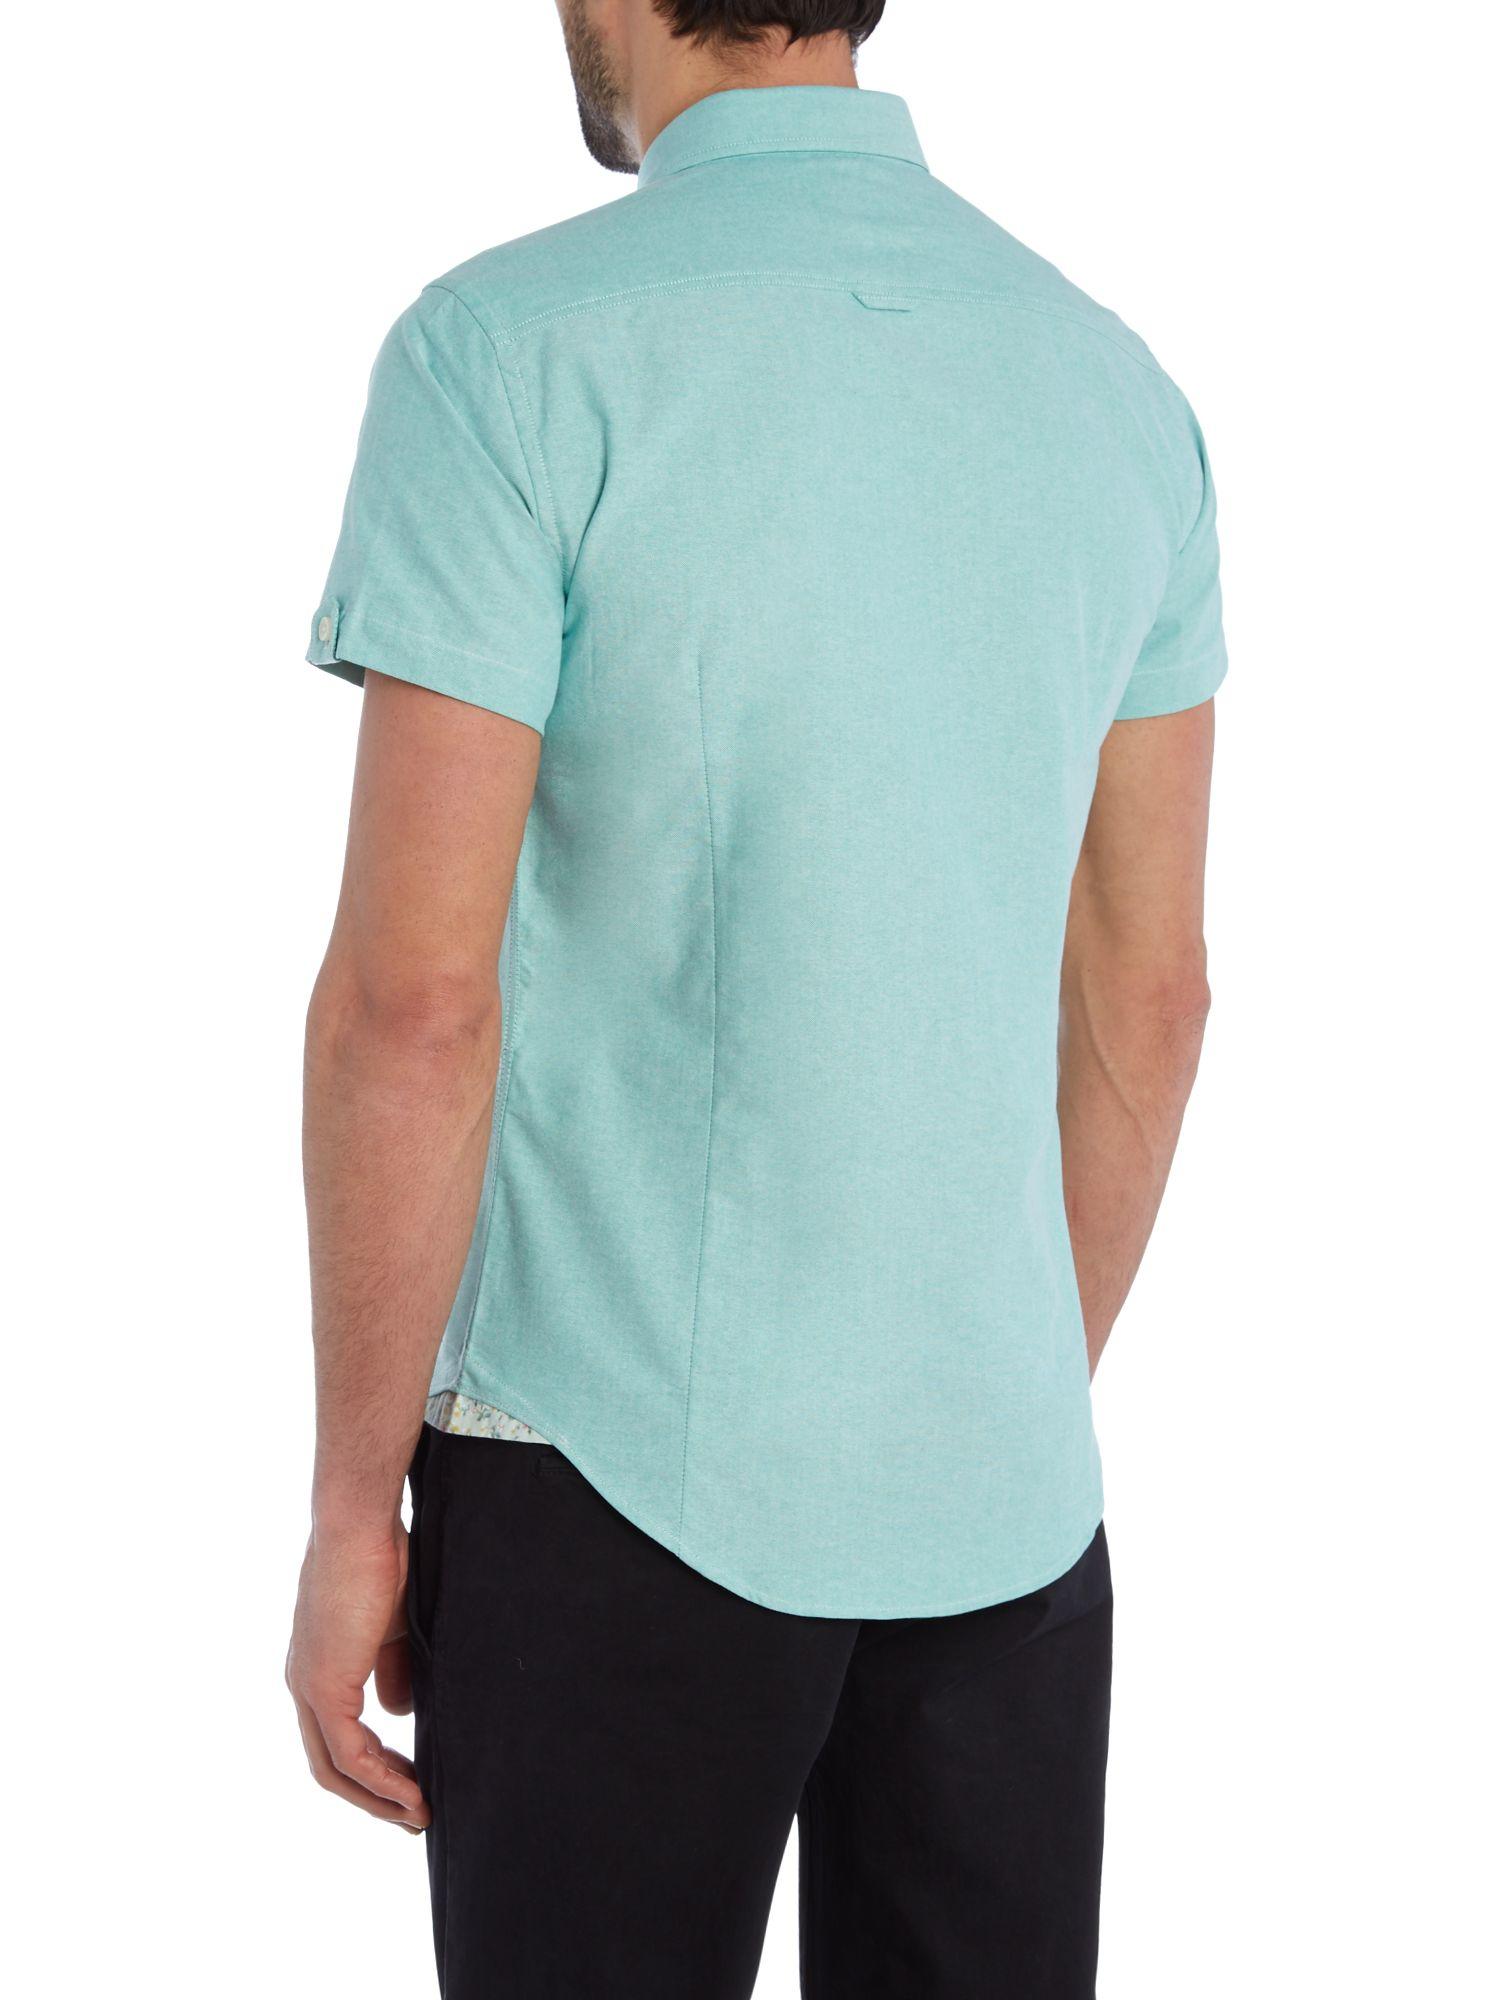 Casual friday plain slim fit short sleeve button down Short sleeve button shirt